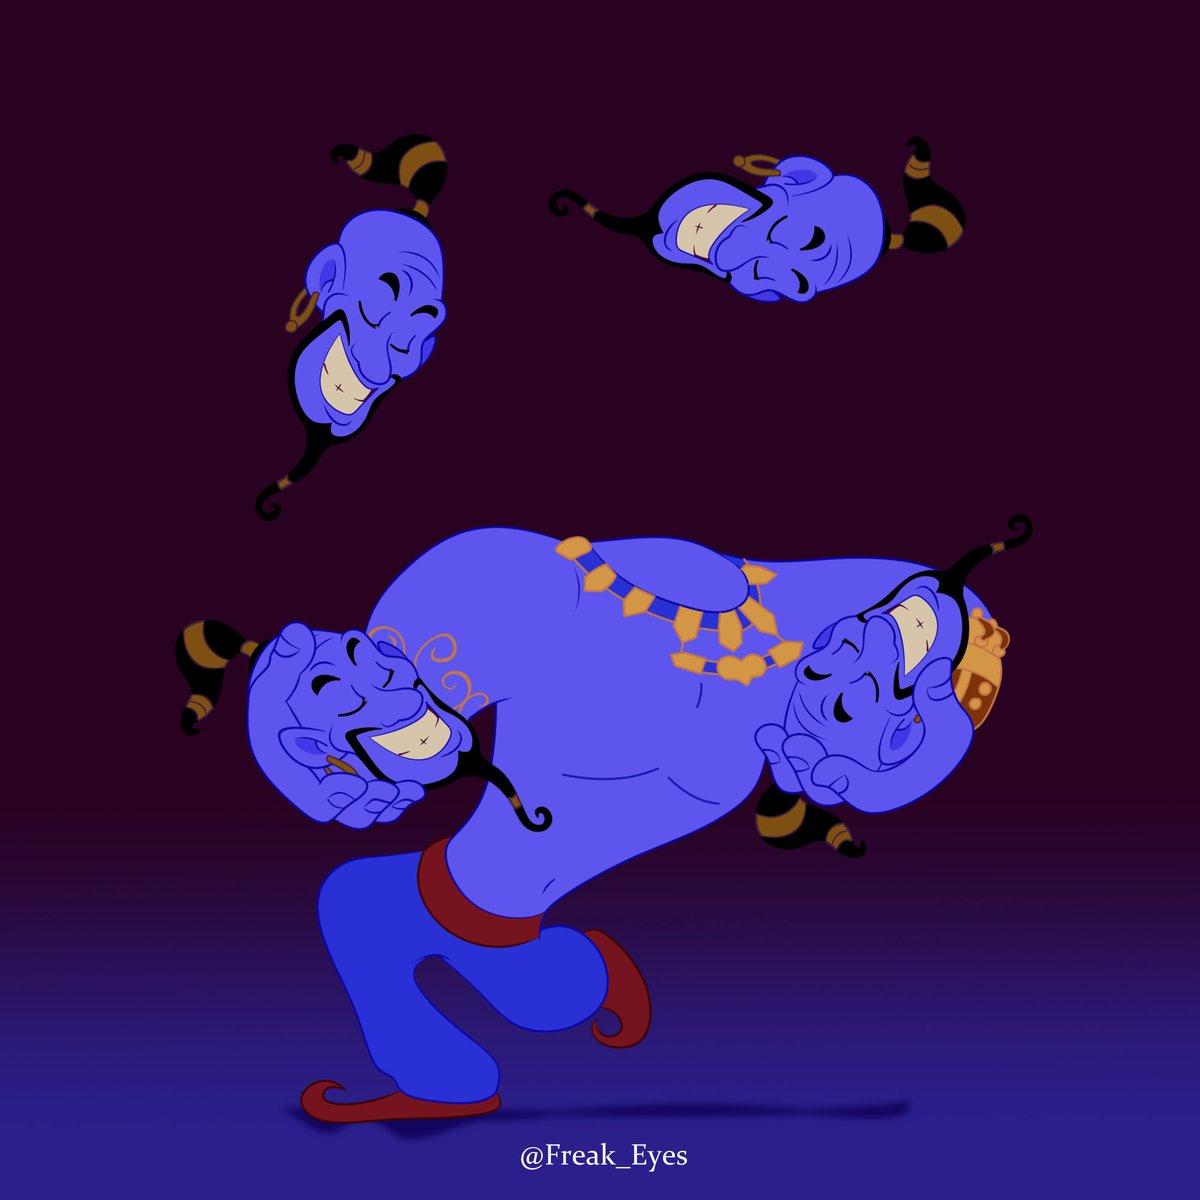 my version of will smith as the genie of Aladdin in animation film  #Aladdin #WillSmithGenie <br>http://pic.twitter.com/0Yiikqxzgu